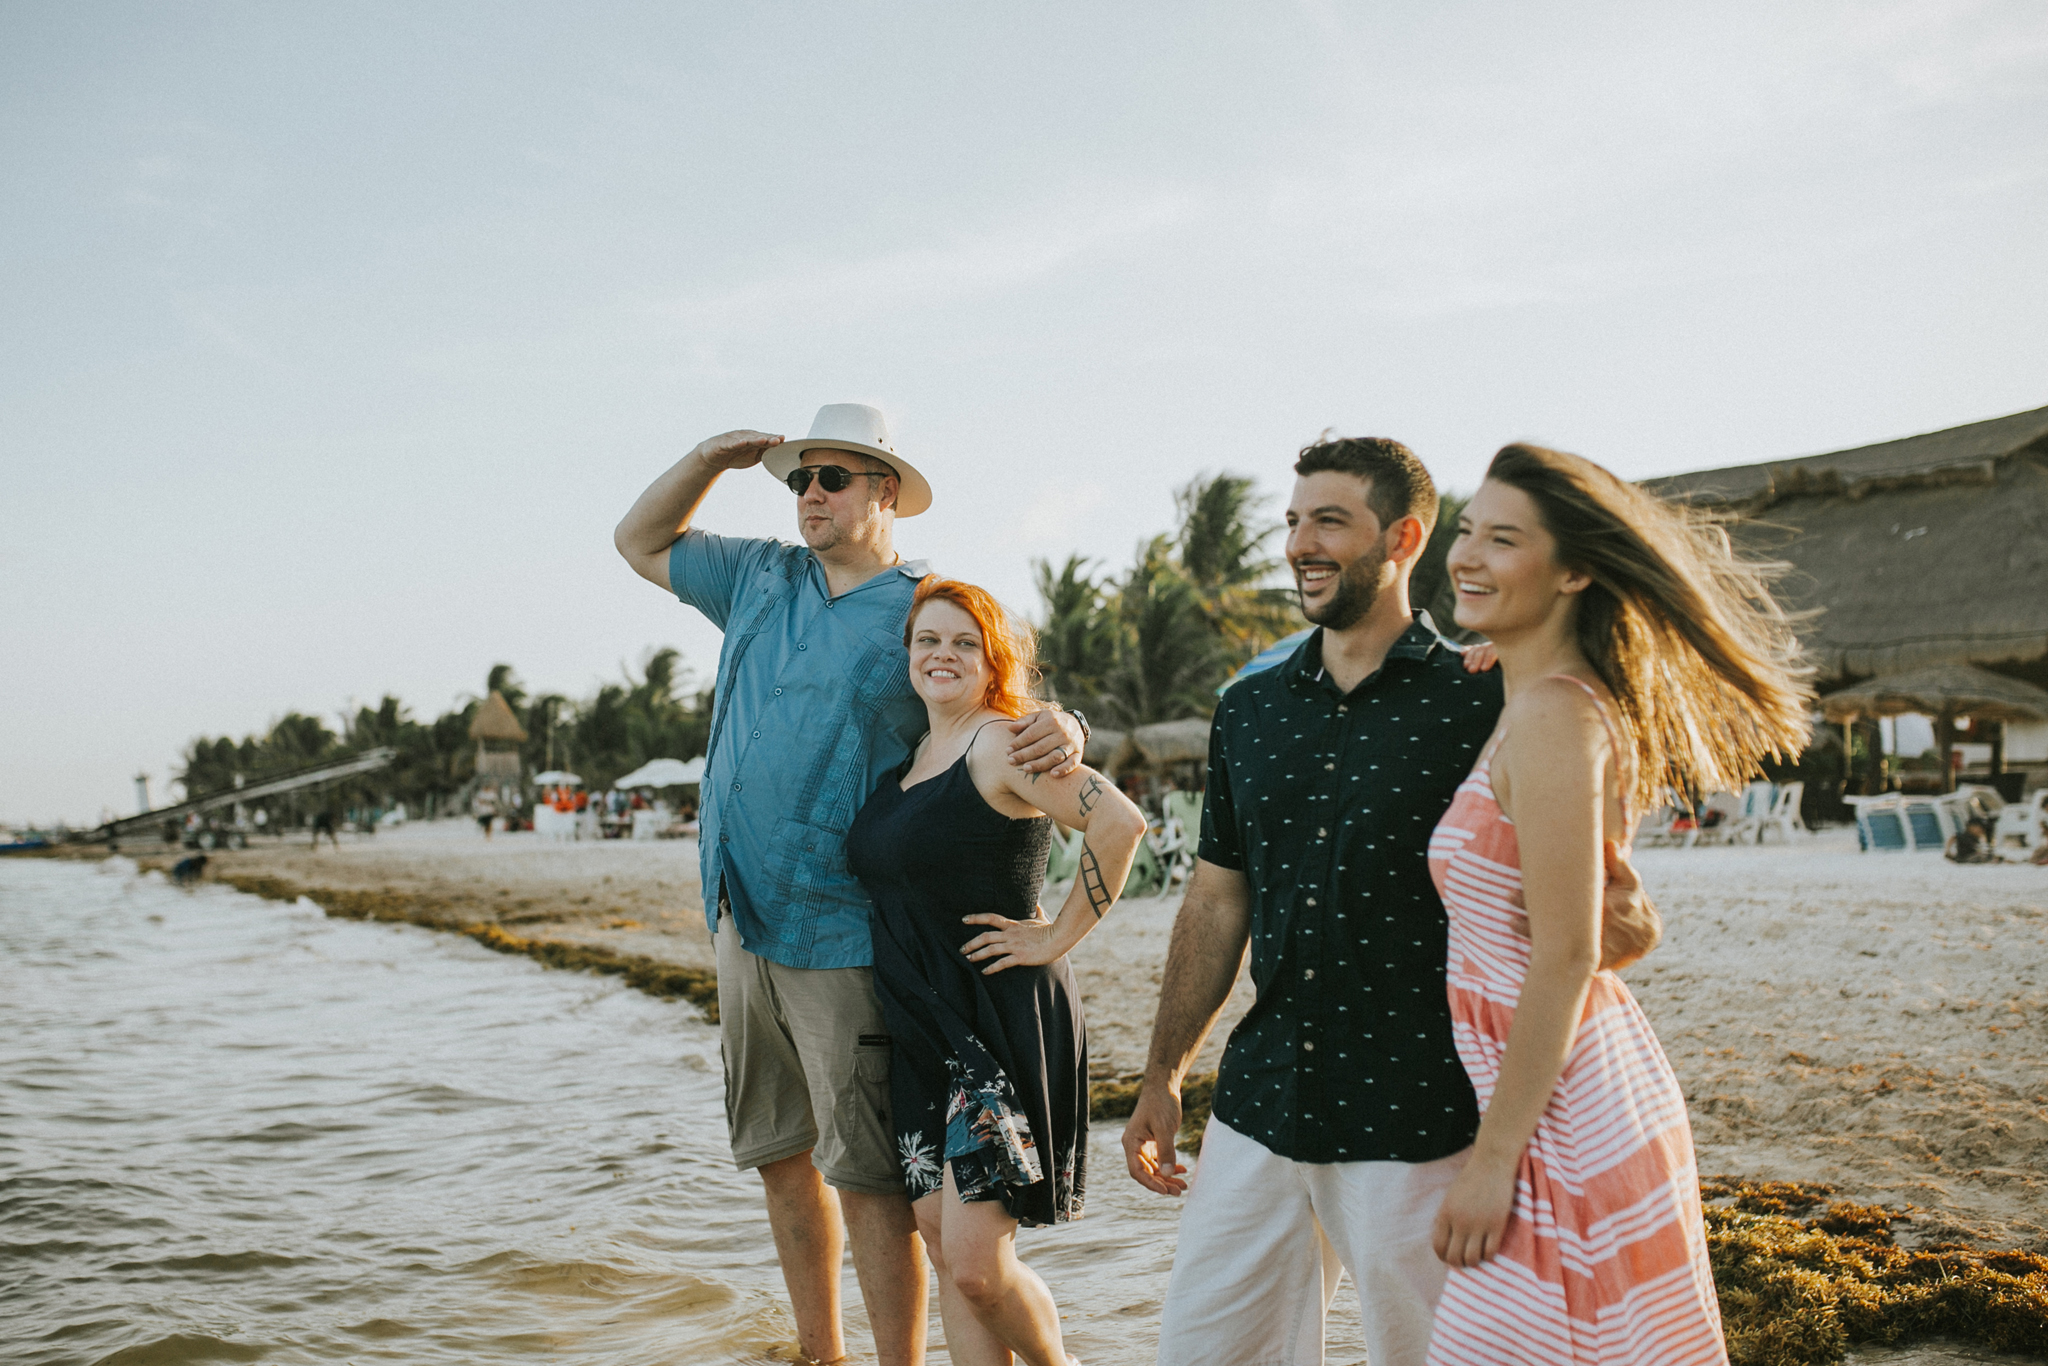 cancun-07-13-2019-family-trip-12_original.jpg